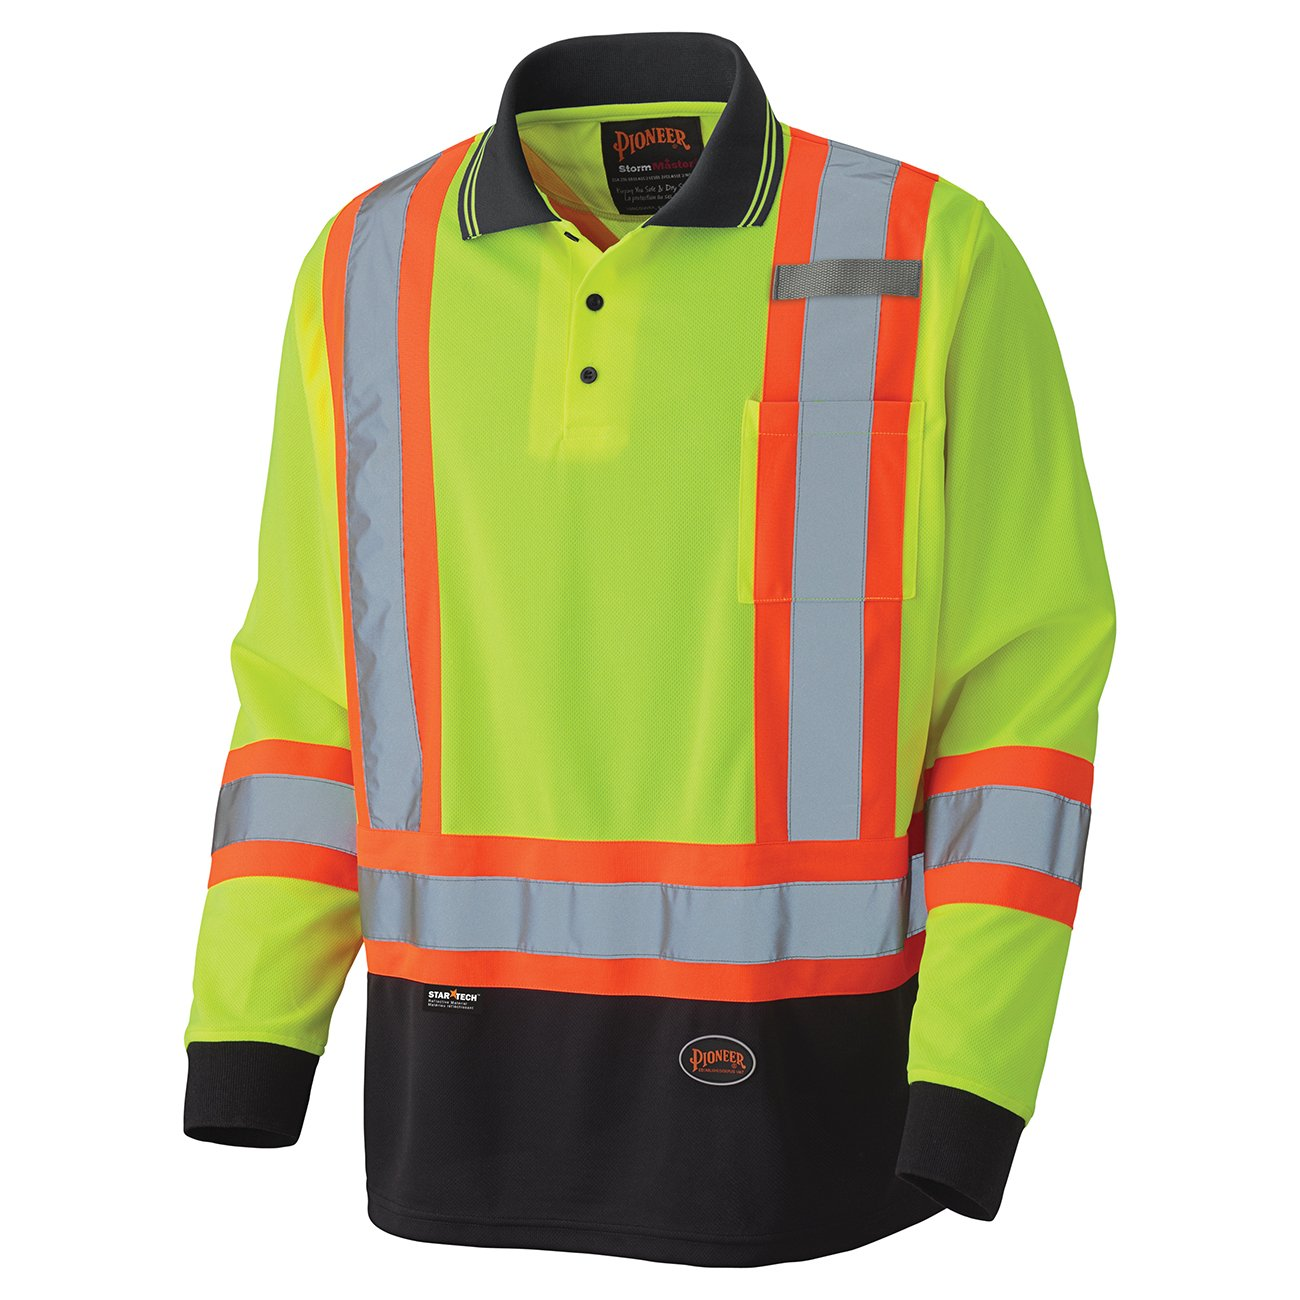 Pioneer Birdseye Long-Sleeved Safety Polo Shirt V1051460